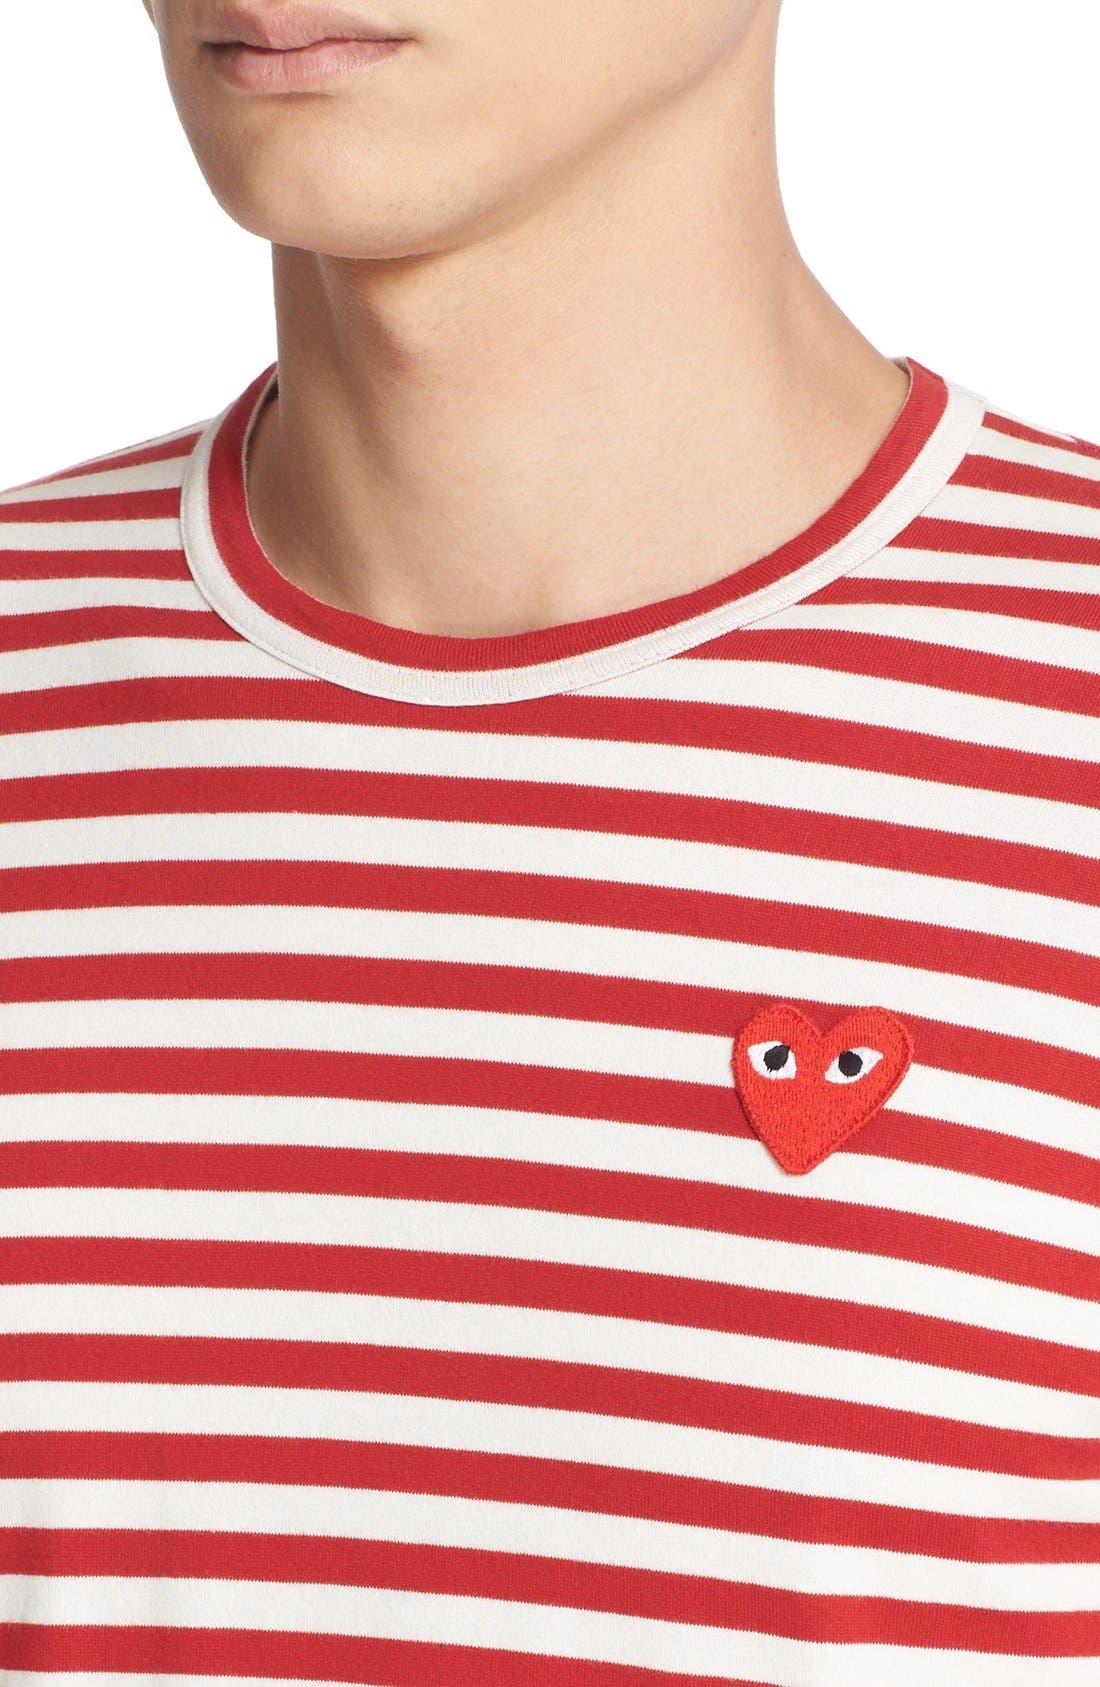 COMME DES GARÇONS PLAY, Stripe Long Sleeve T-Shirt, Alternate thumbnail 5, color, RED/ WHITE